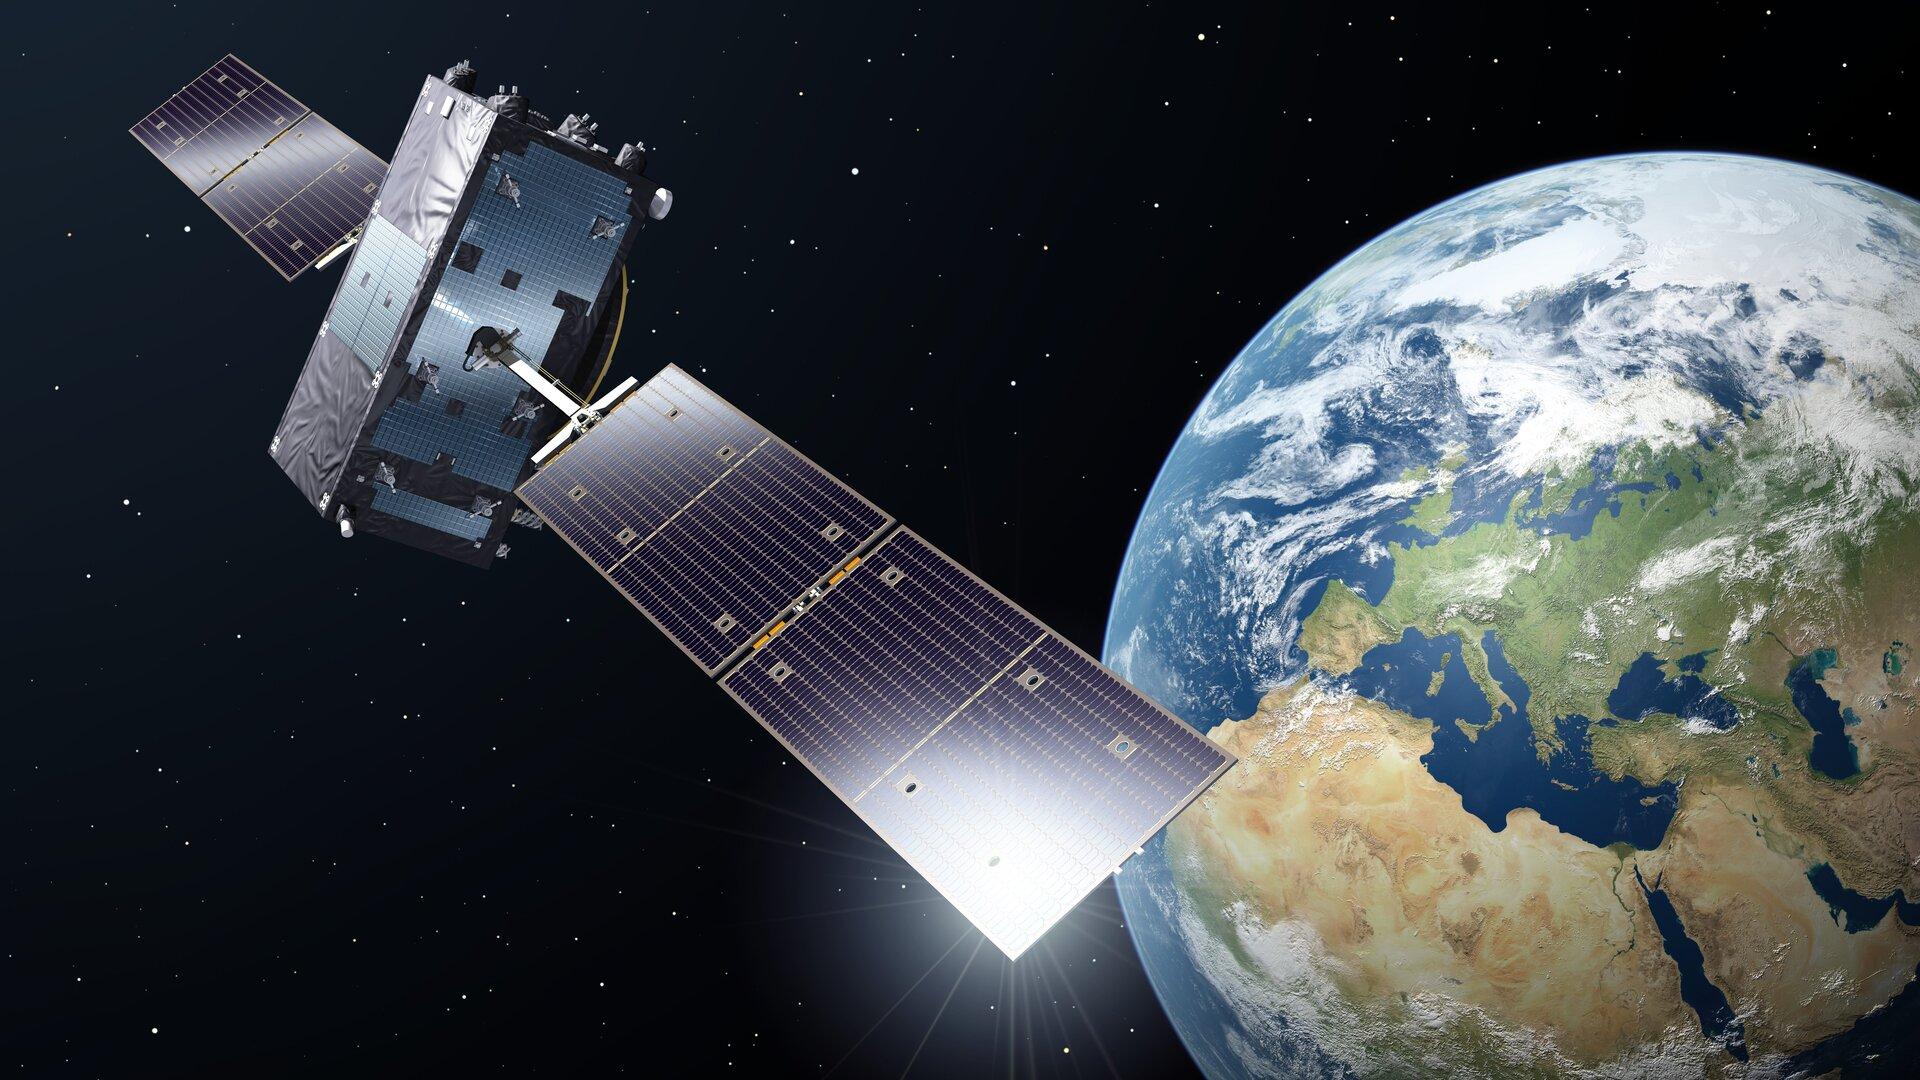 ASI - ESA, due contratti per i satelliti di Galileo Next Generation